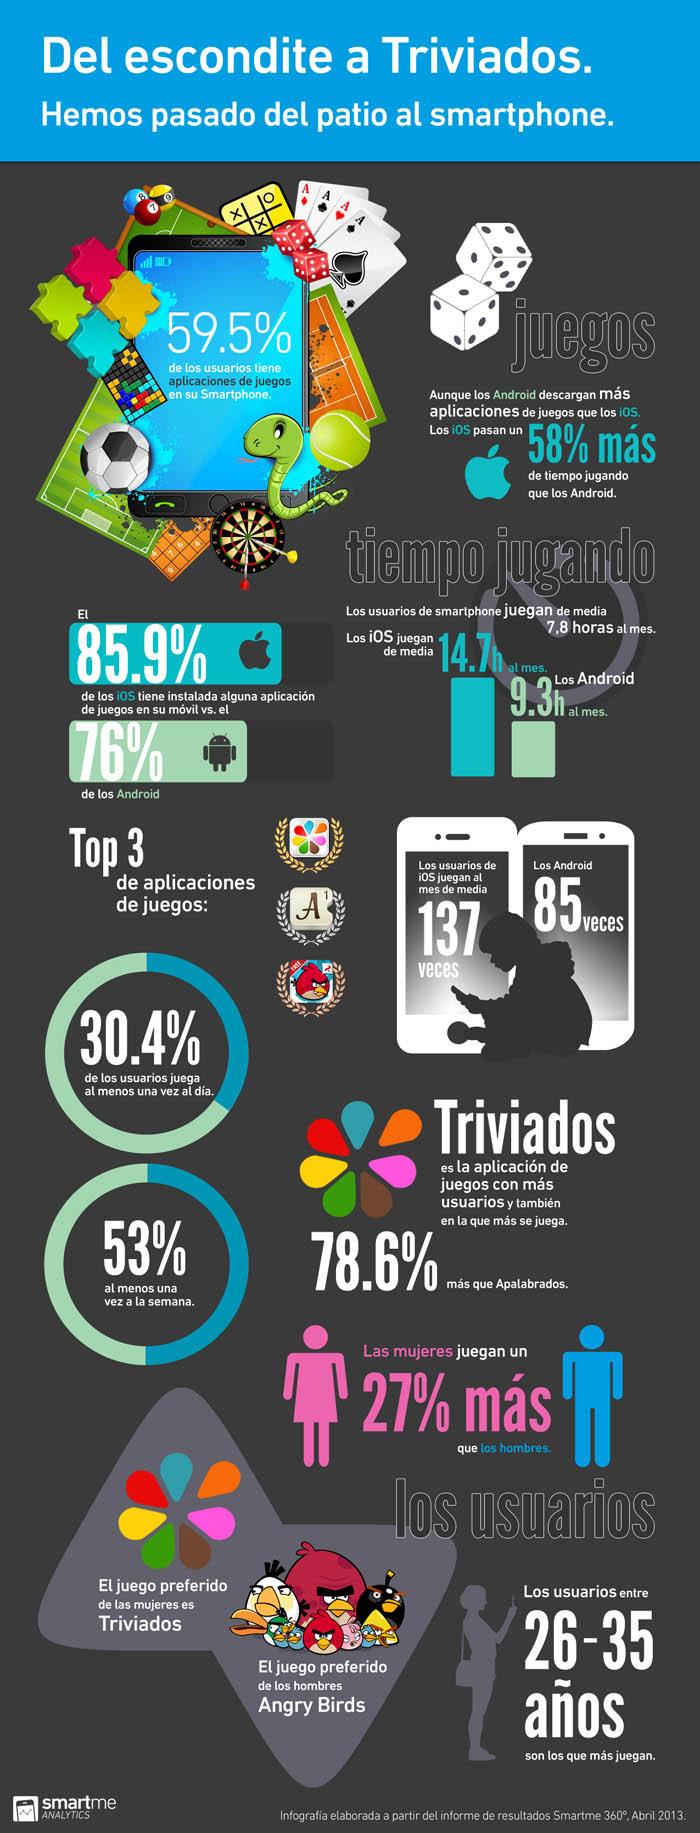 videojuegos para móviles - Infografía